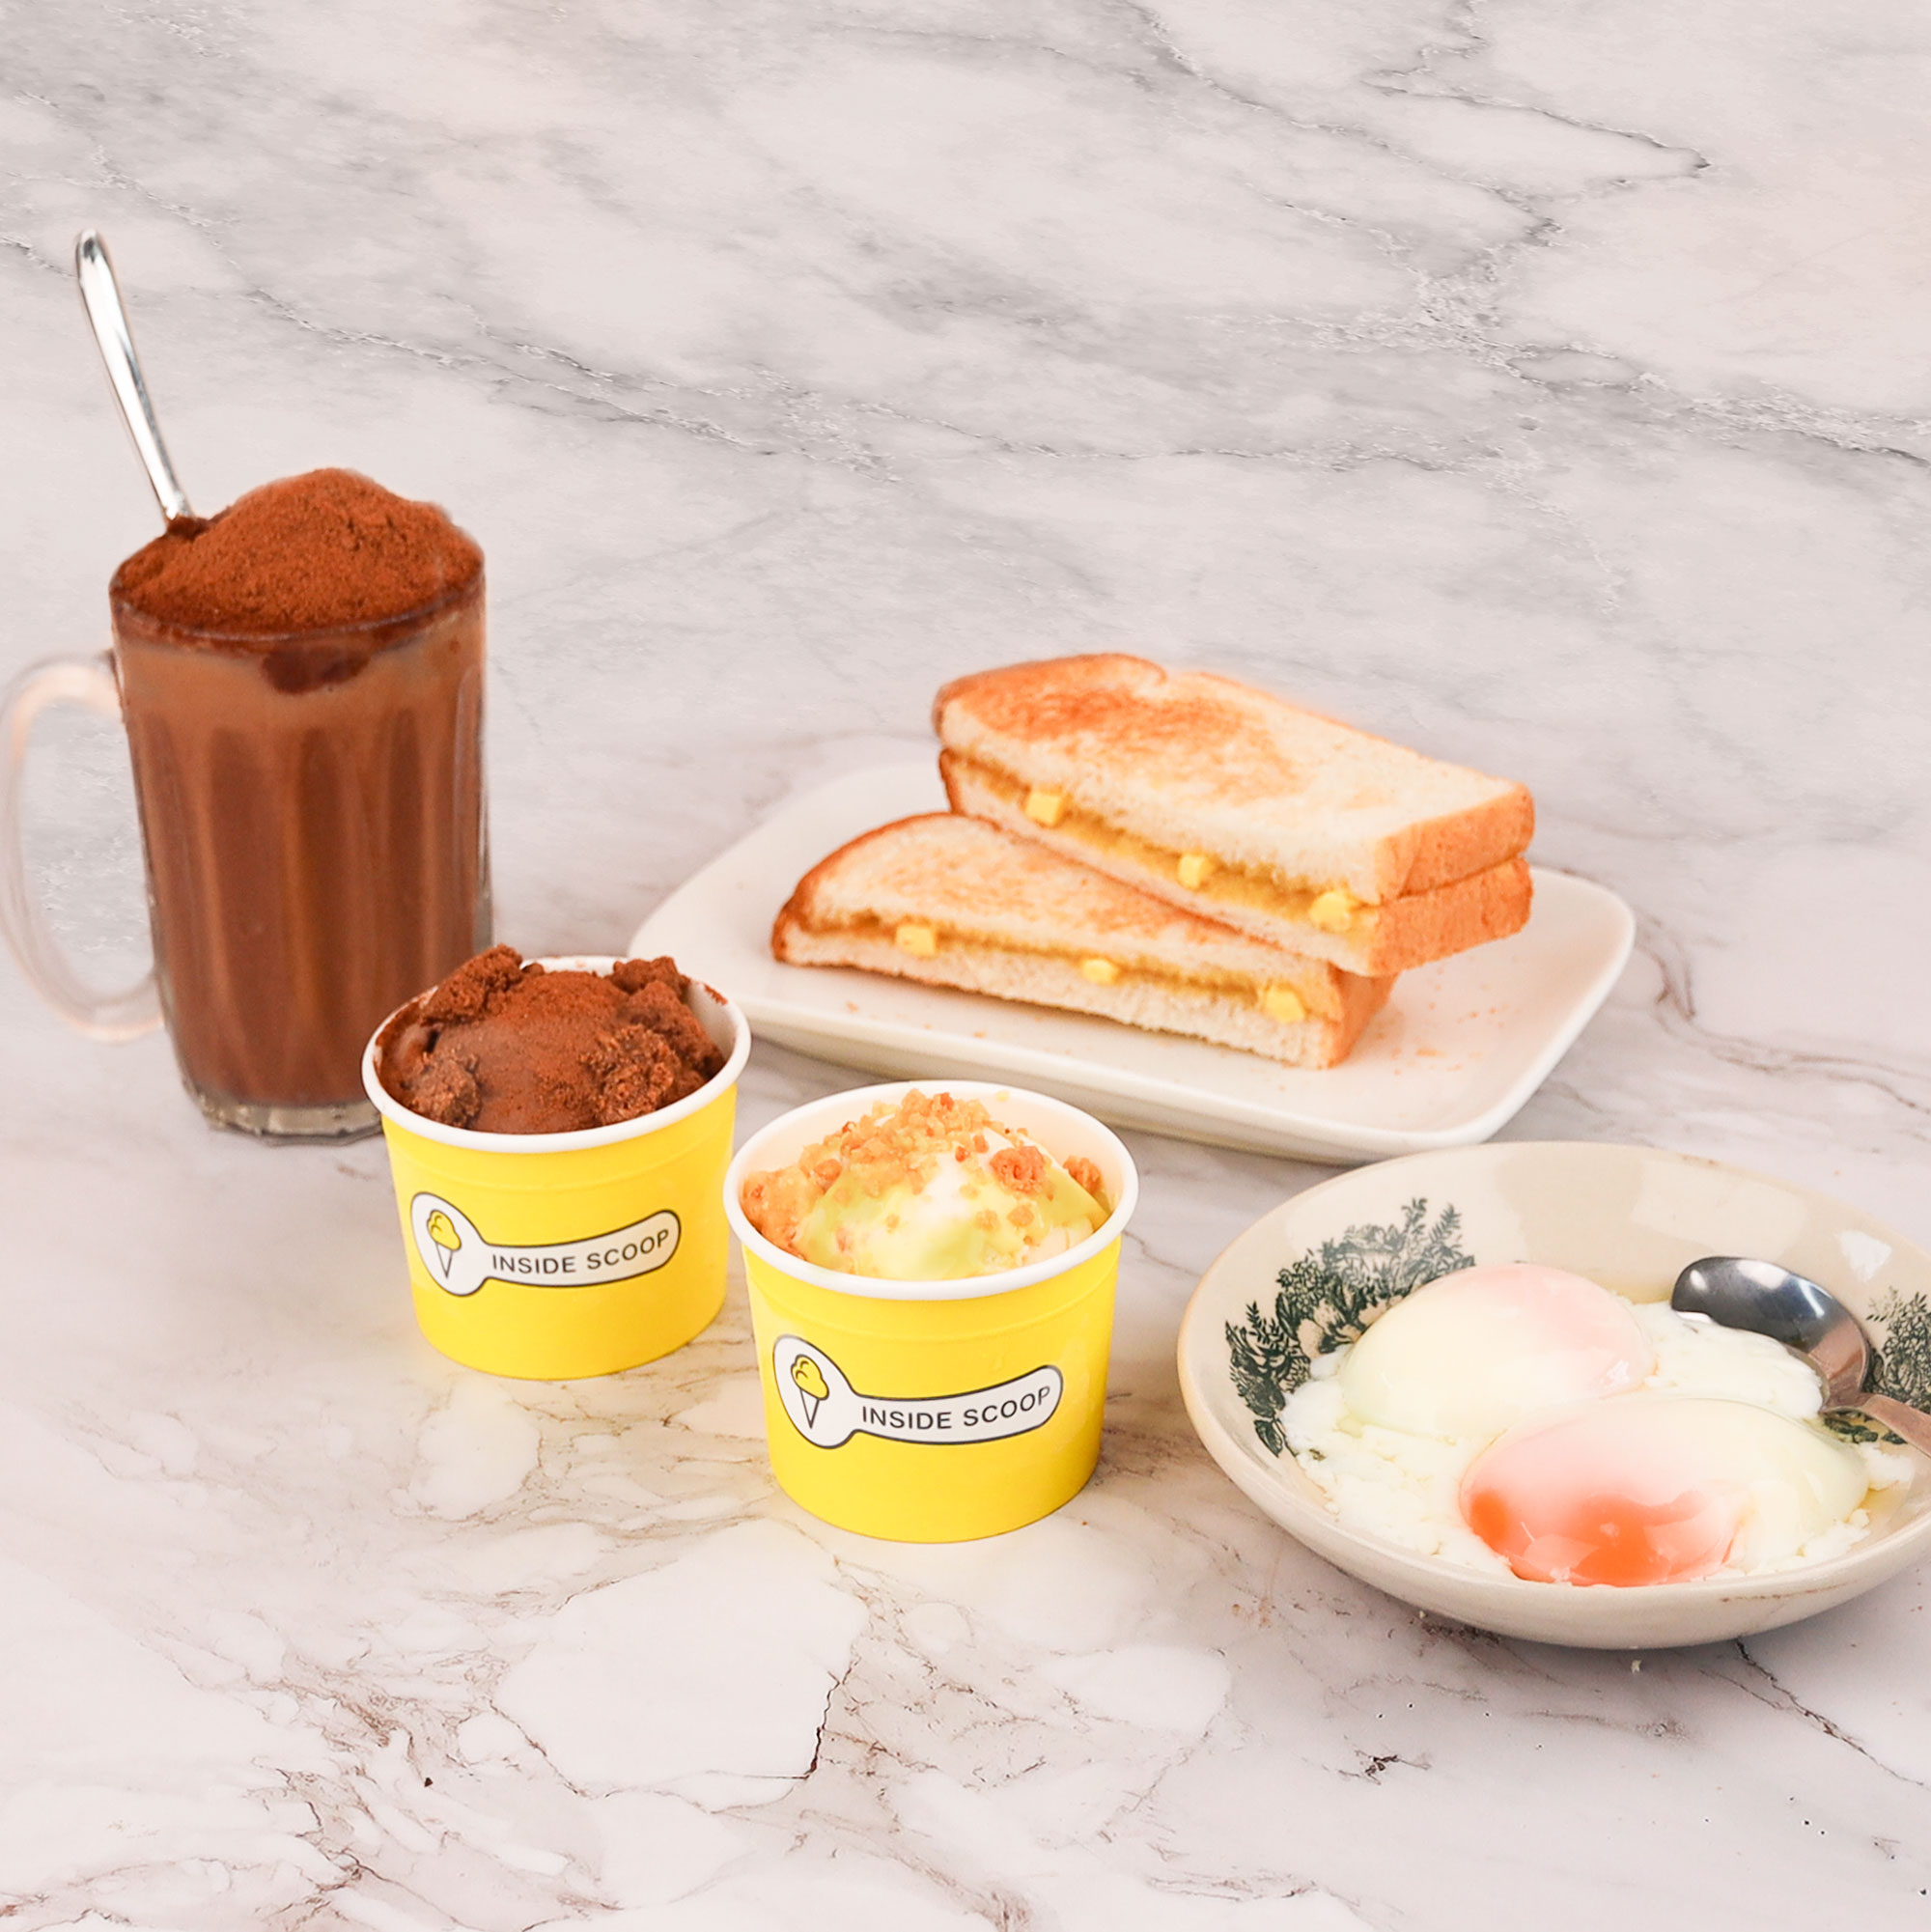 Kickstart the day with Inside Scoop's Breakfast Set